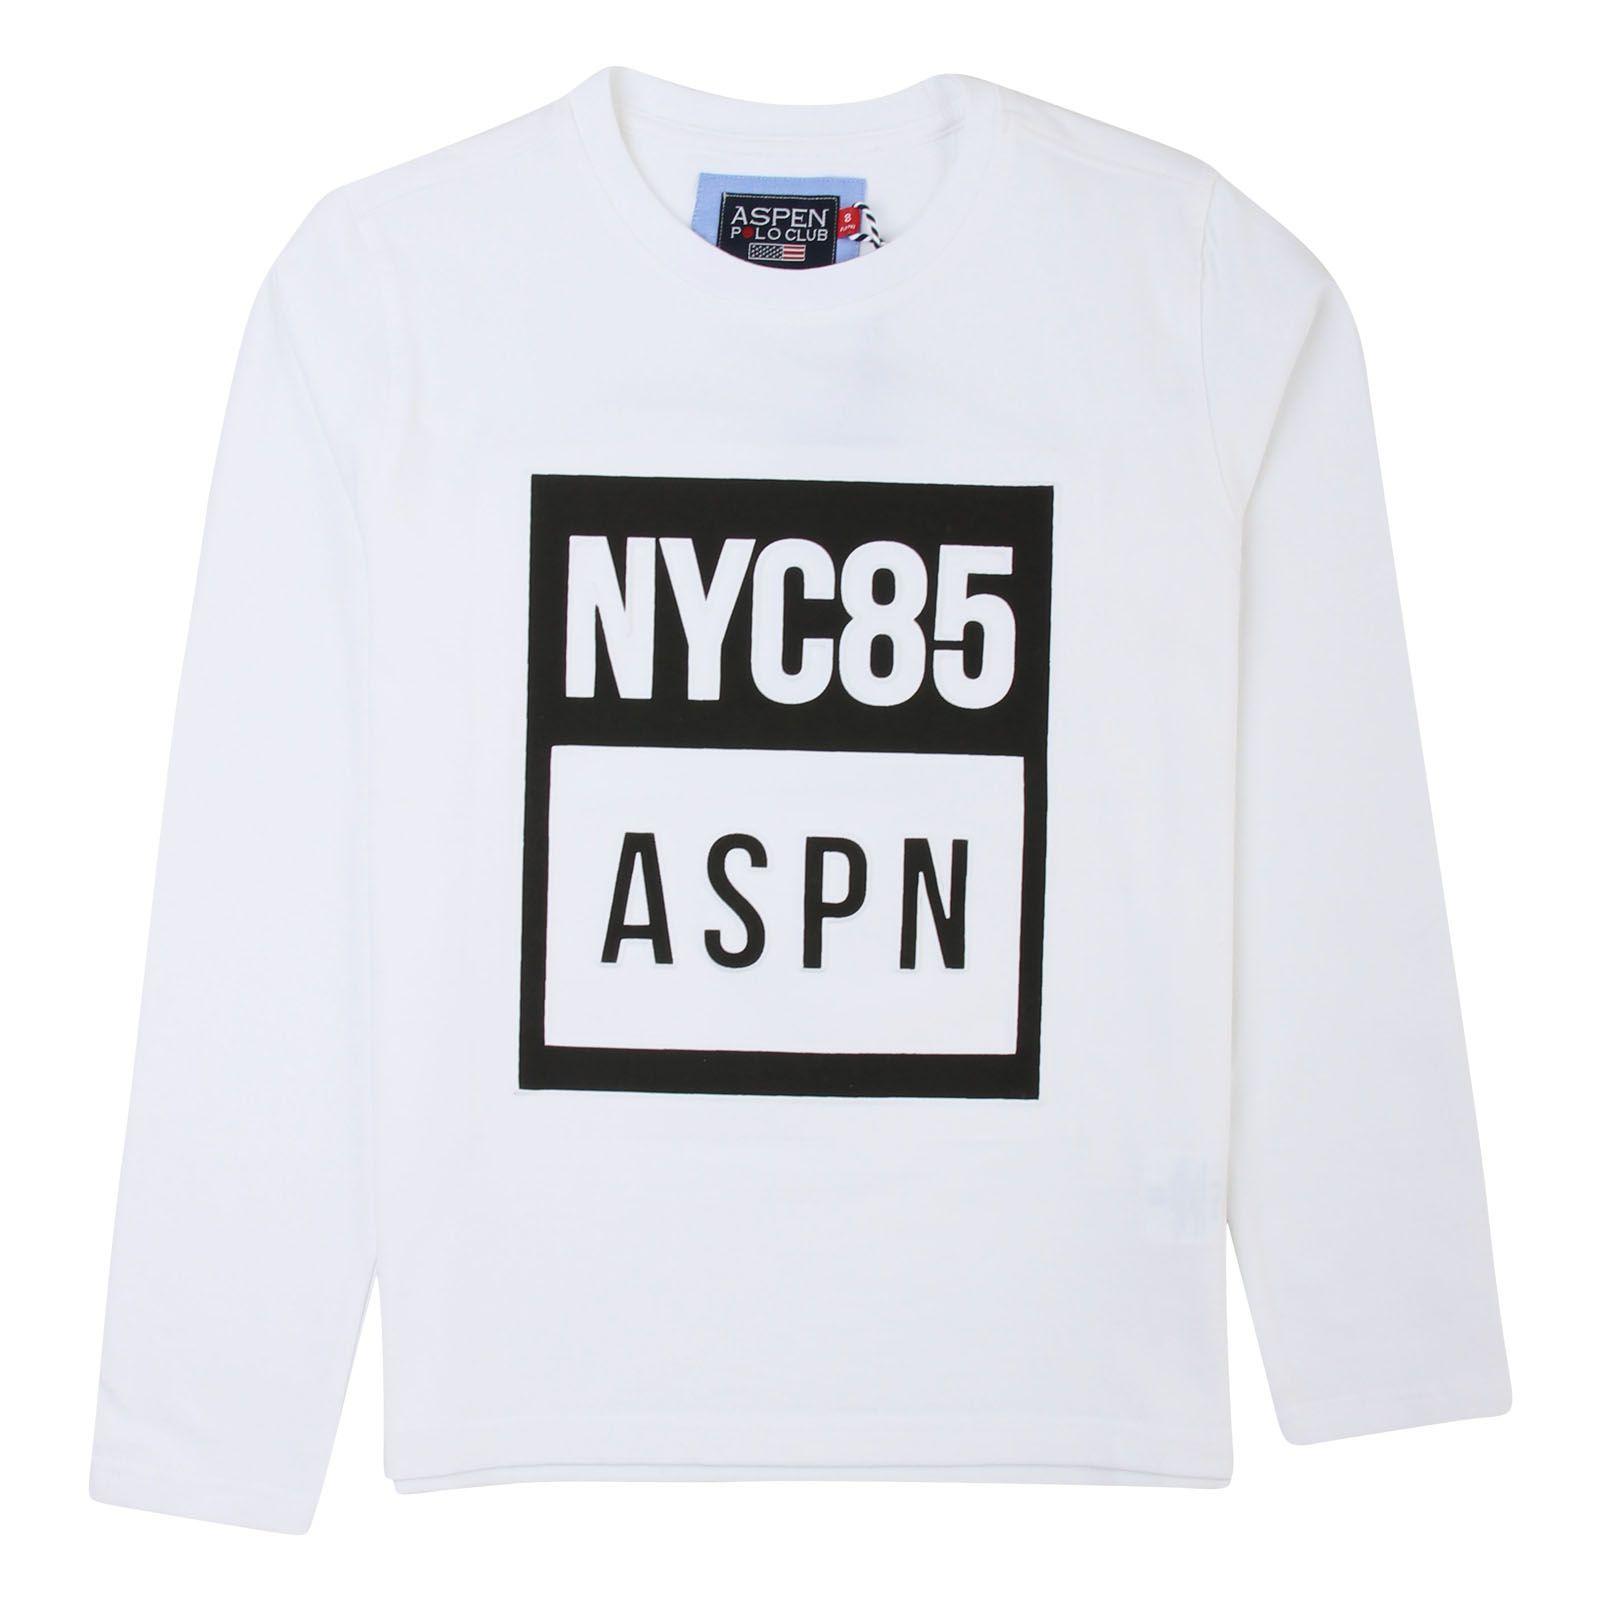 Aspen Polo Club Boys T-Shirt